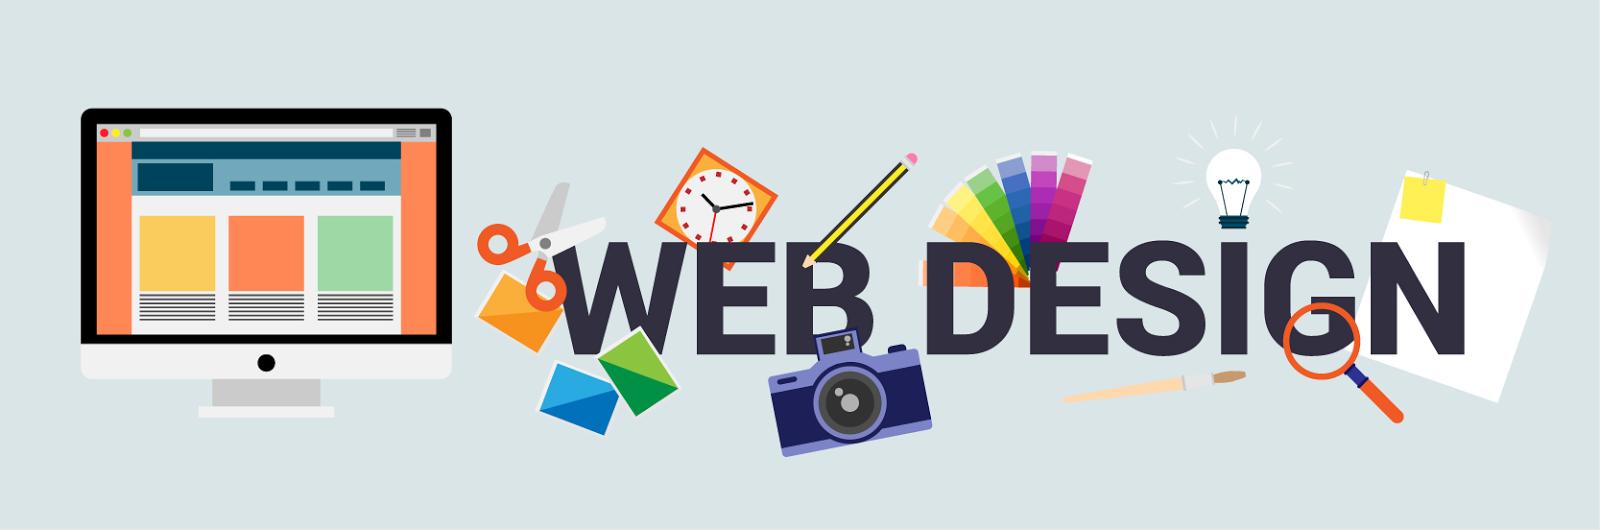 Top Classified Ads Web Design & Development in Saudi Arabia 1 CodeShip